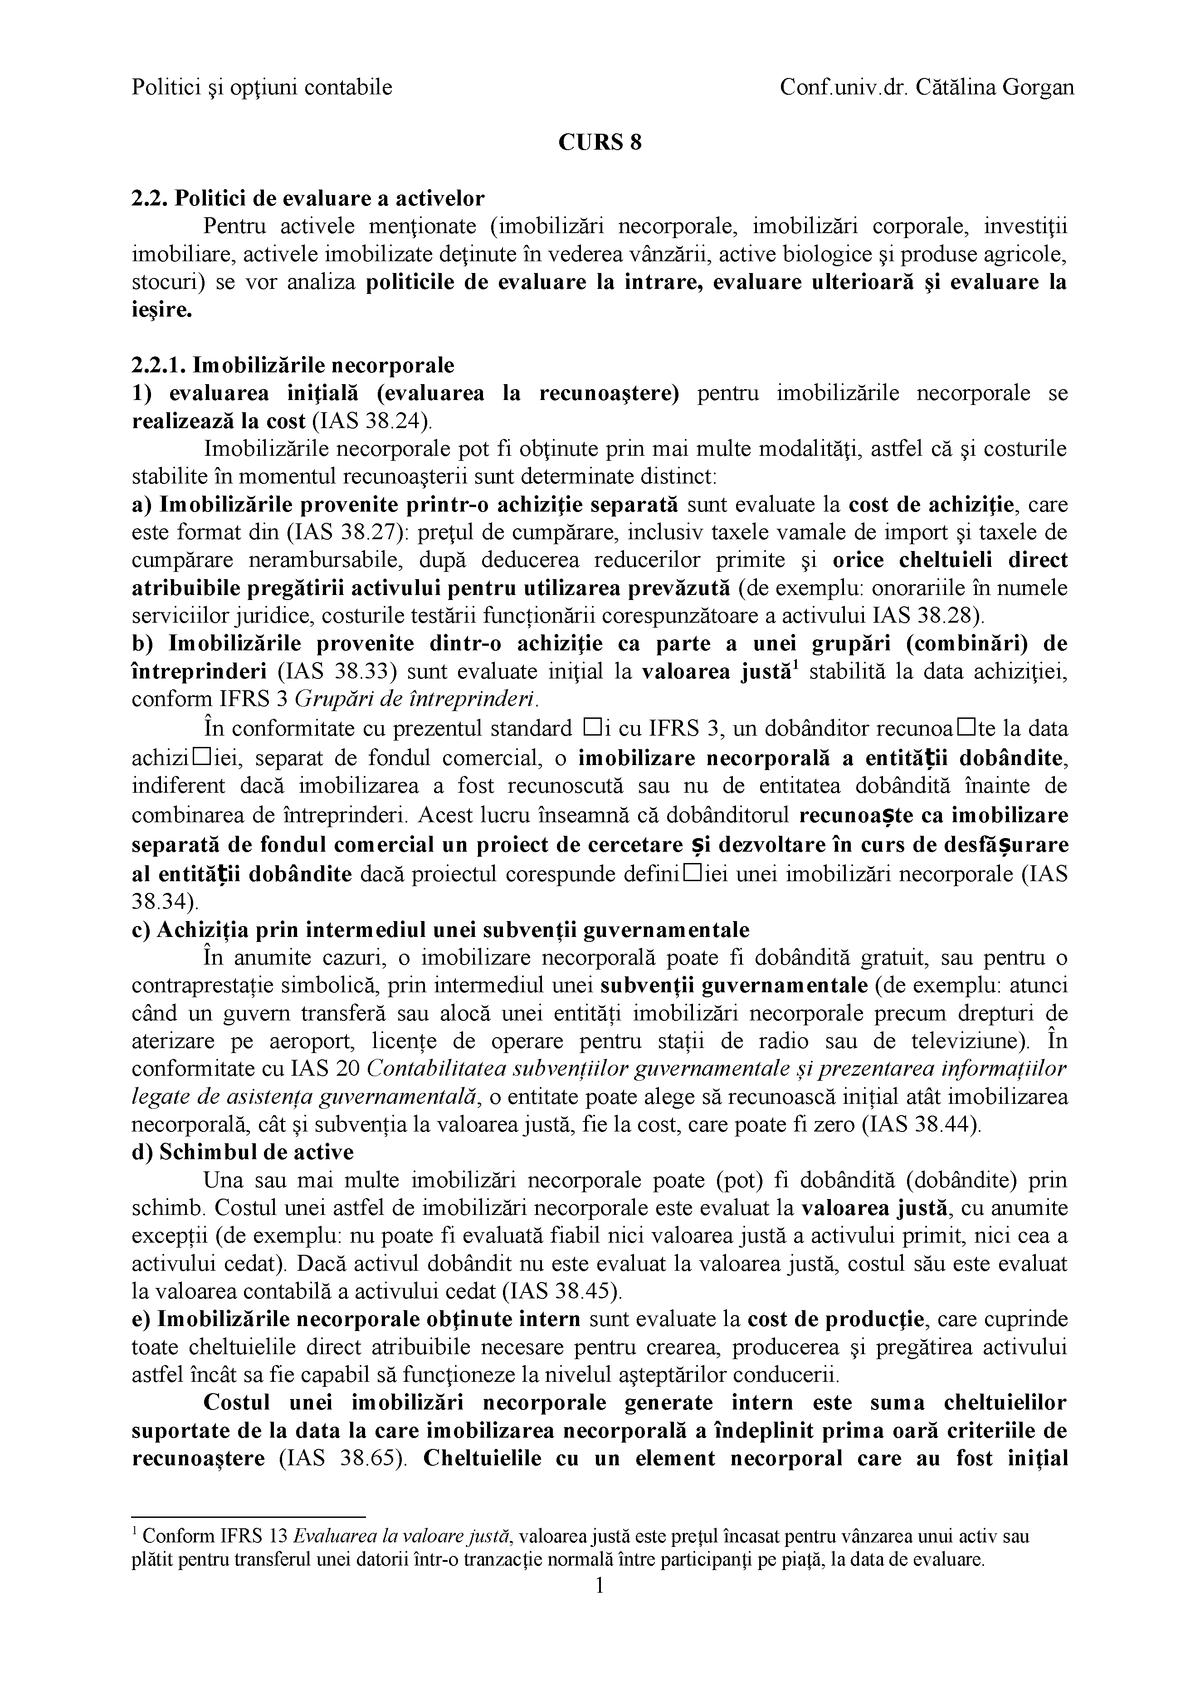 Contabilitatea instrumentelor financiare derivate - optiunile